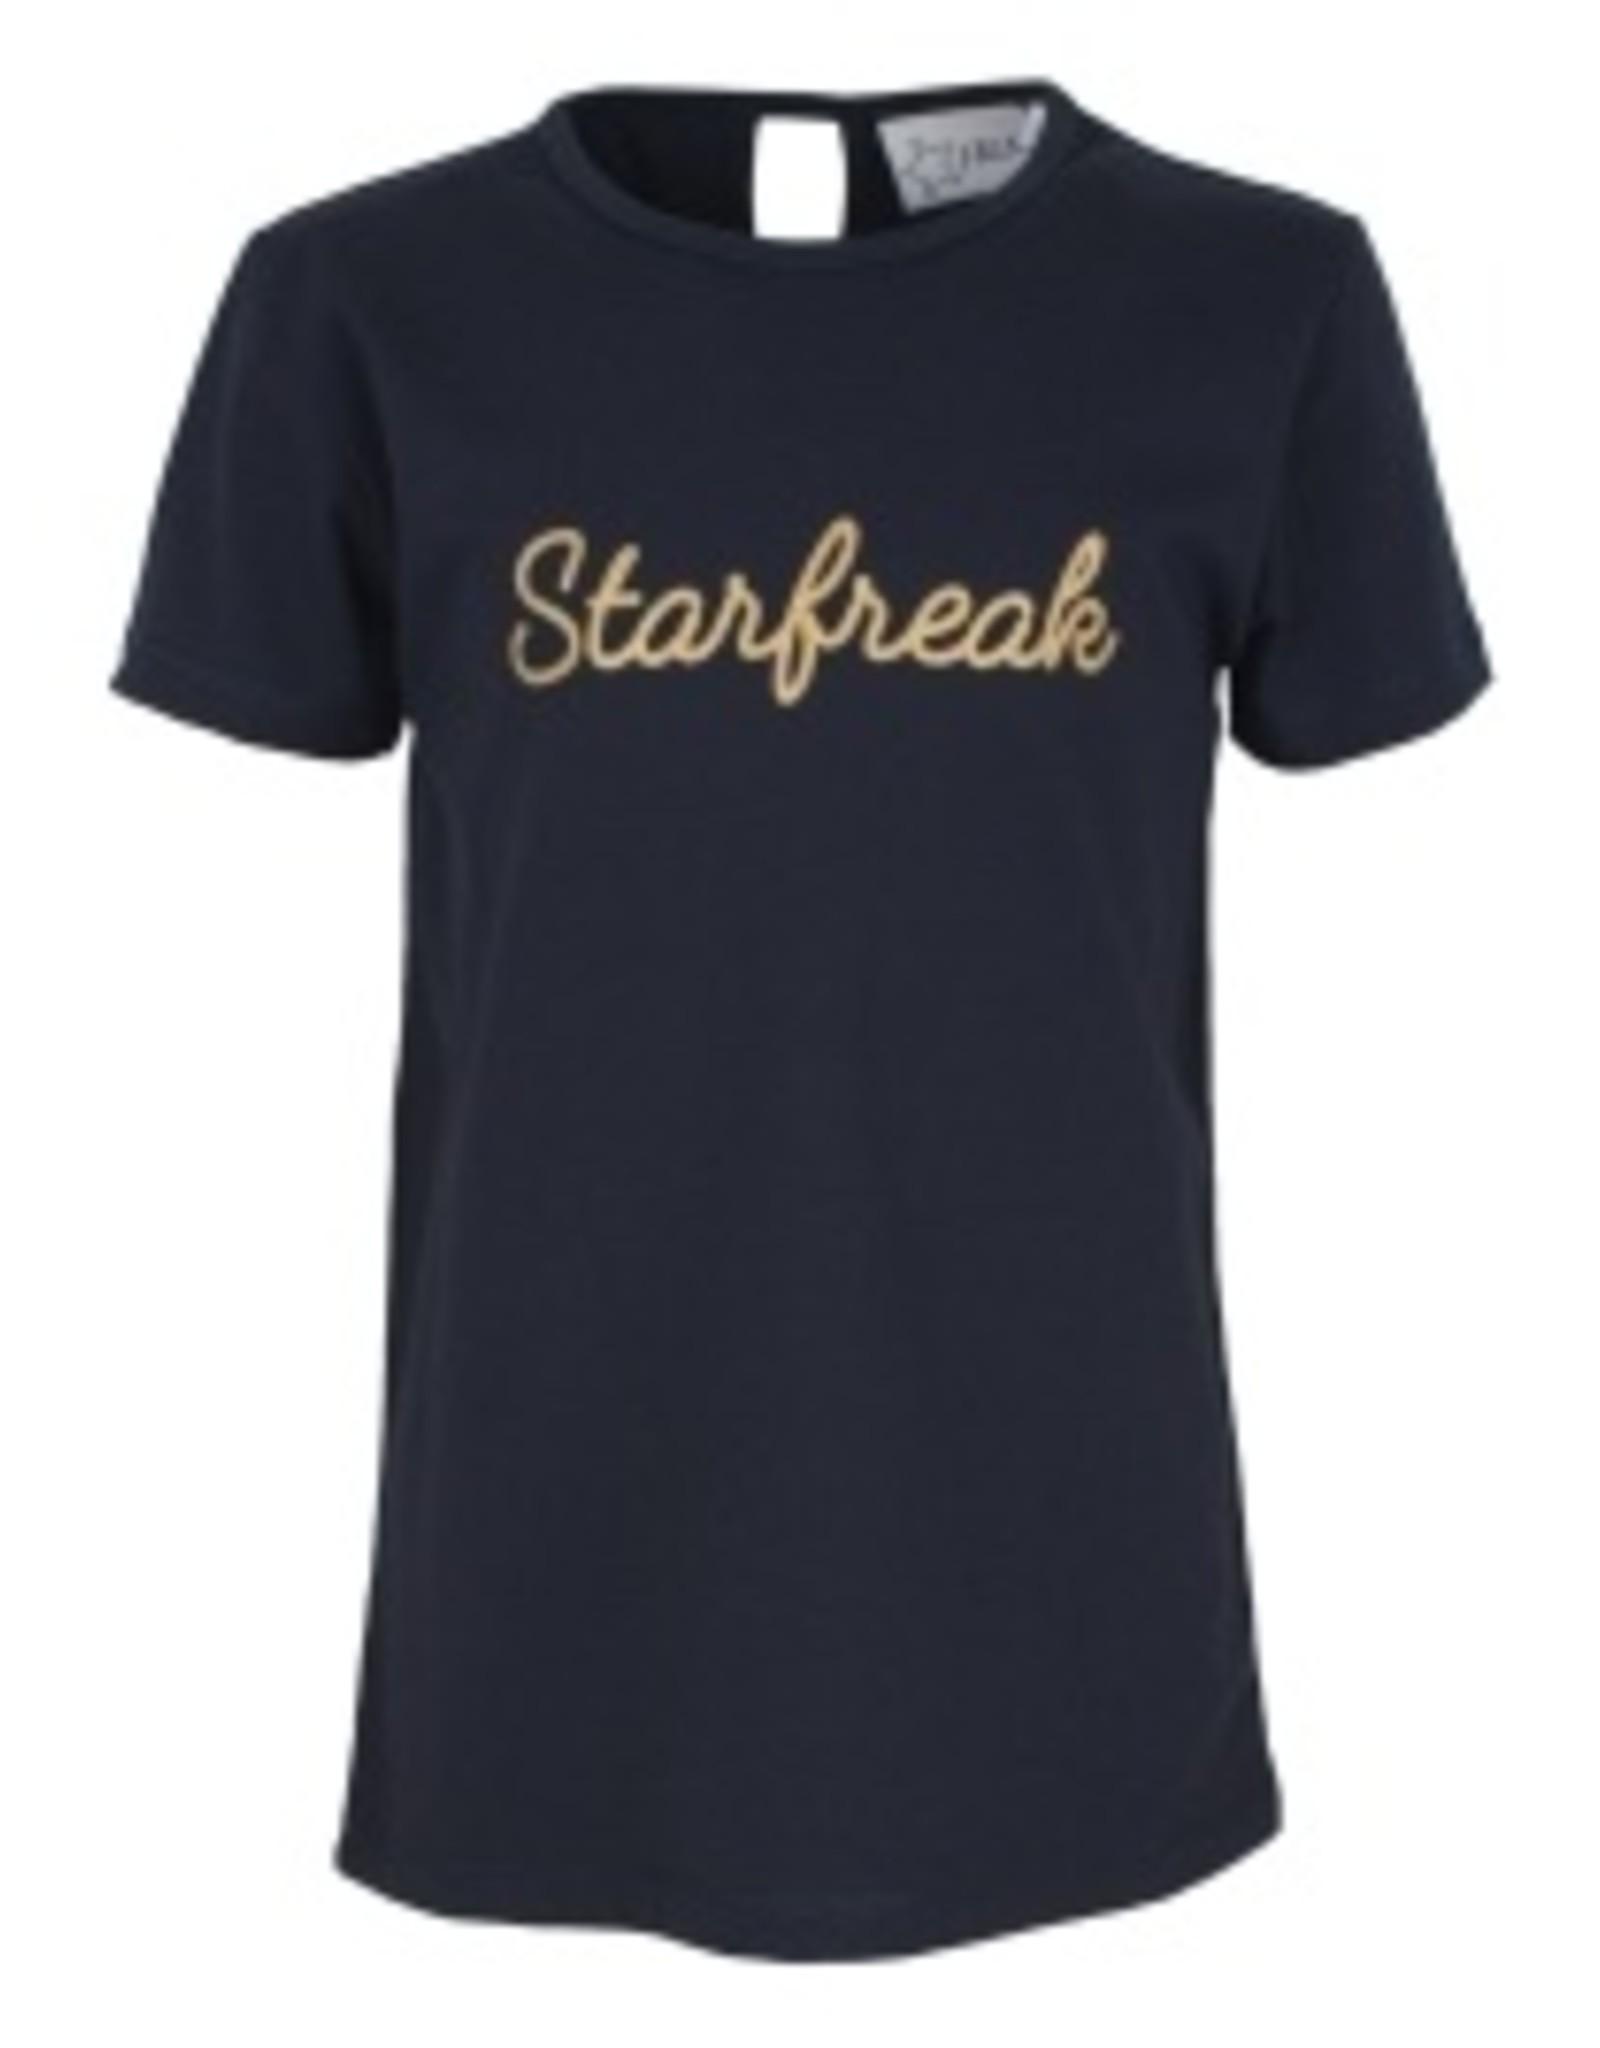 Starfreak Starfreak T-shirt Jersey Co/Elastan Solid Blue